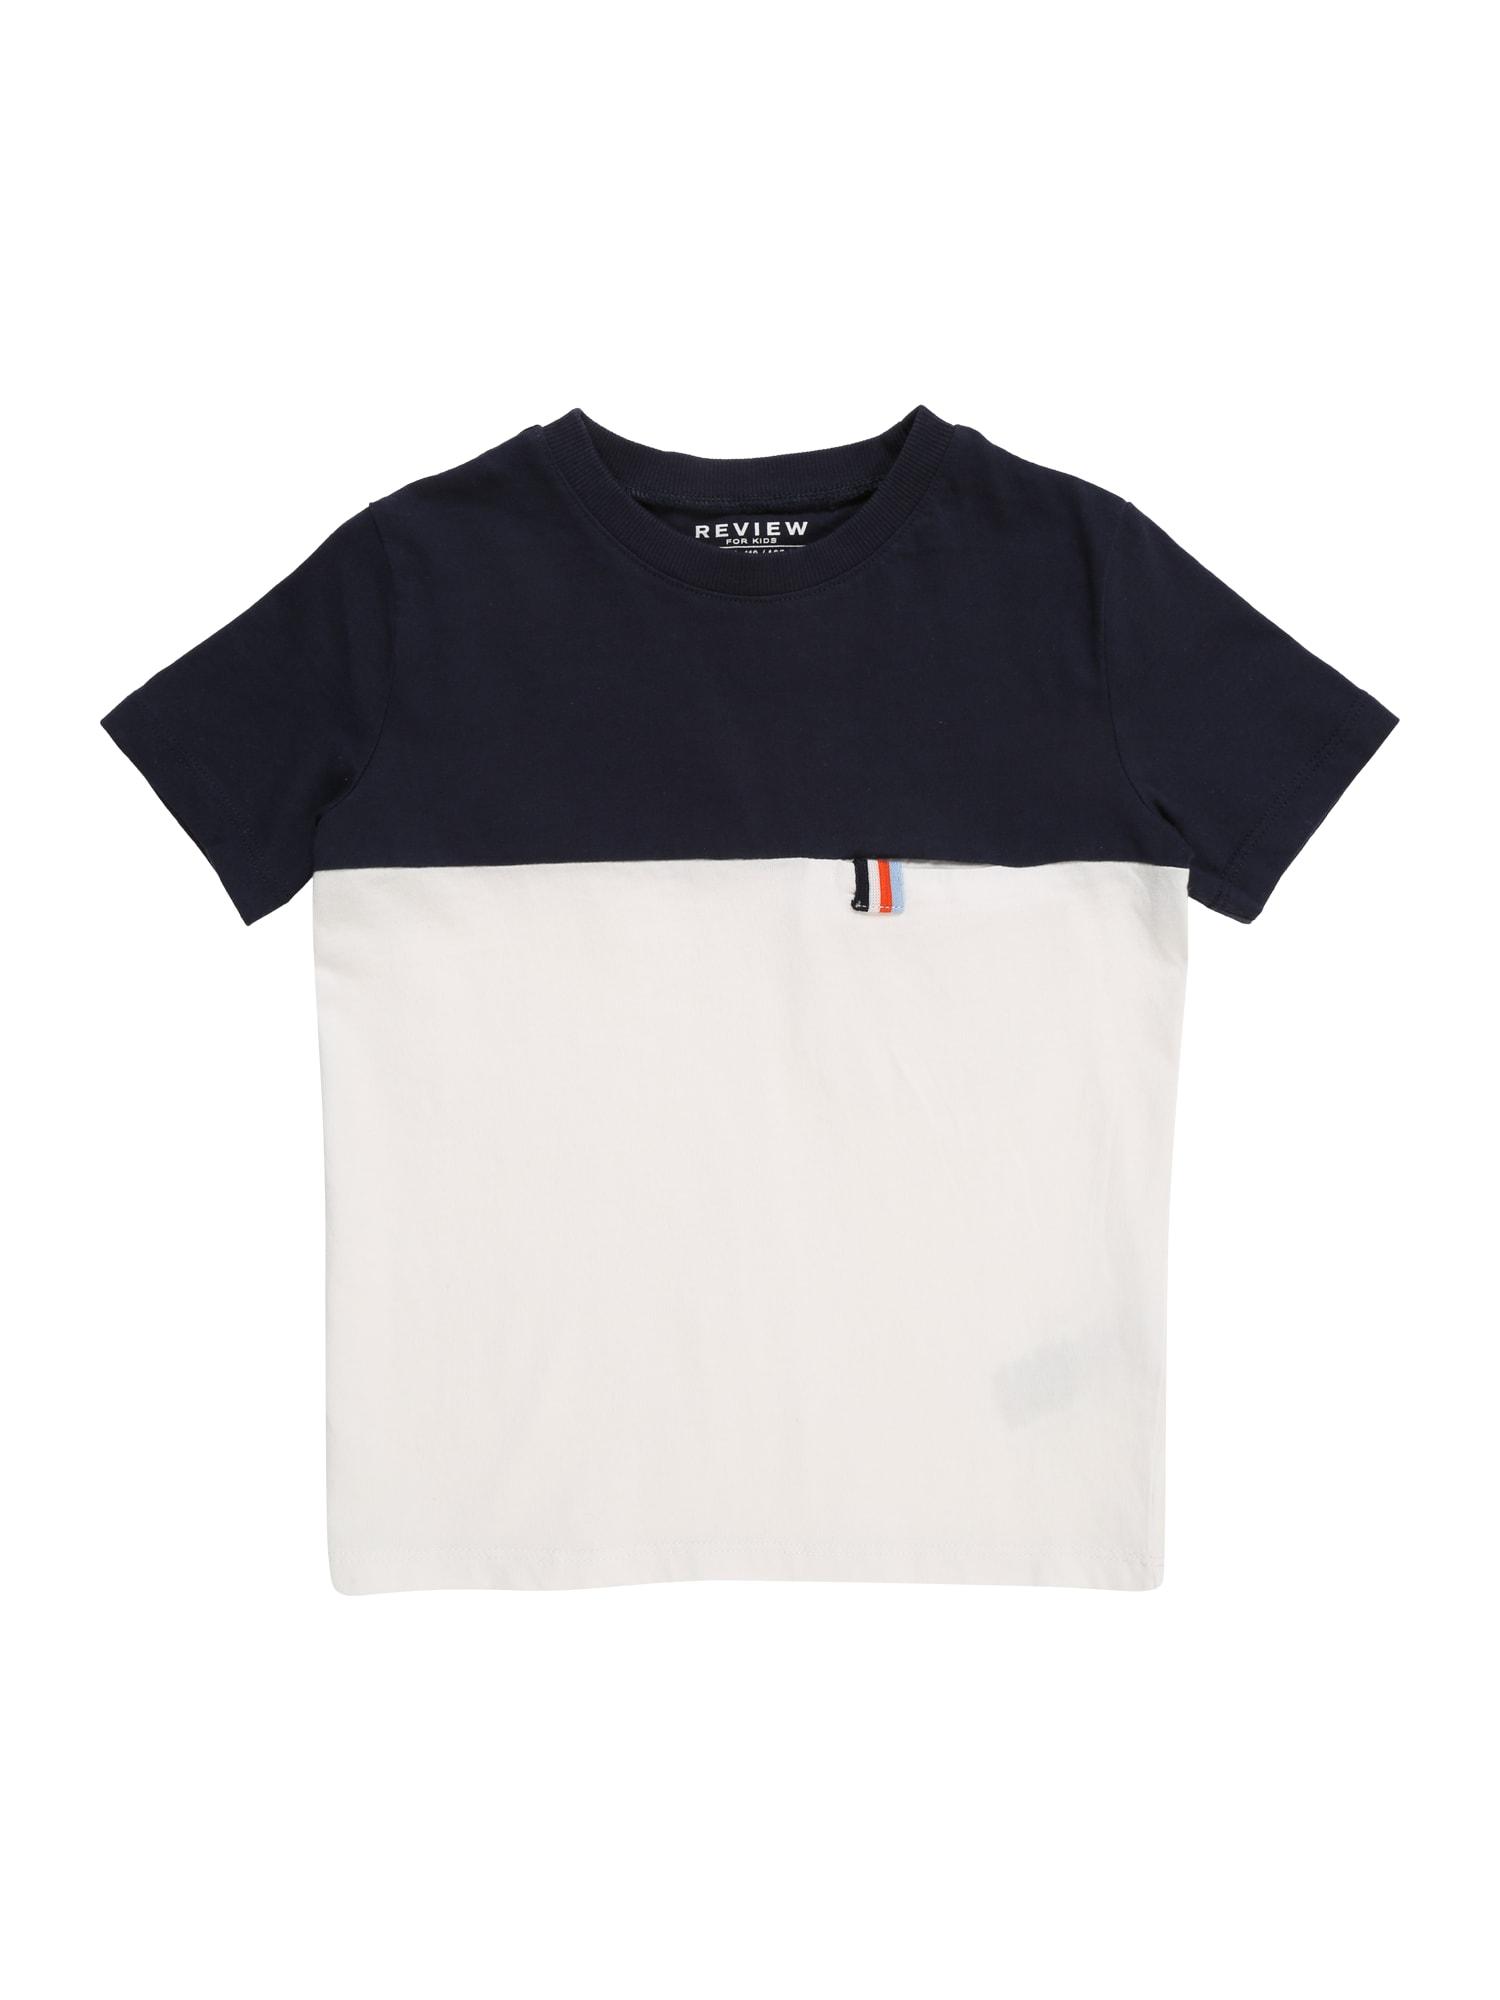 Tričko KB-19-T211 námořnická modř bílá REVIEW FOR KIDS